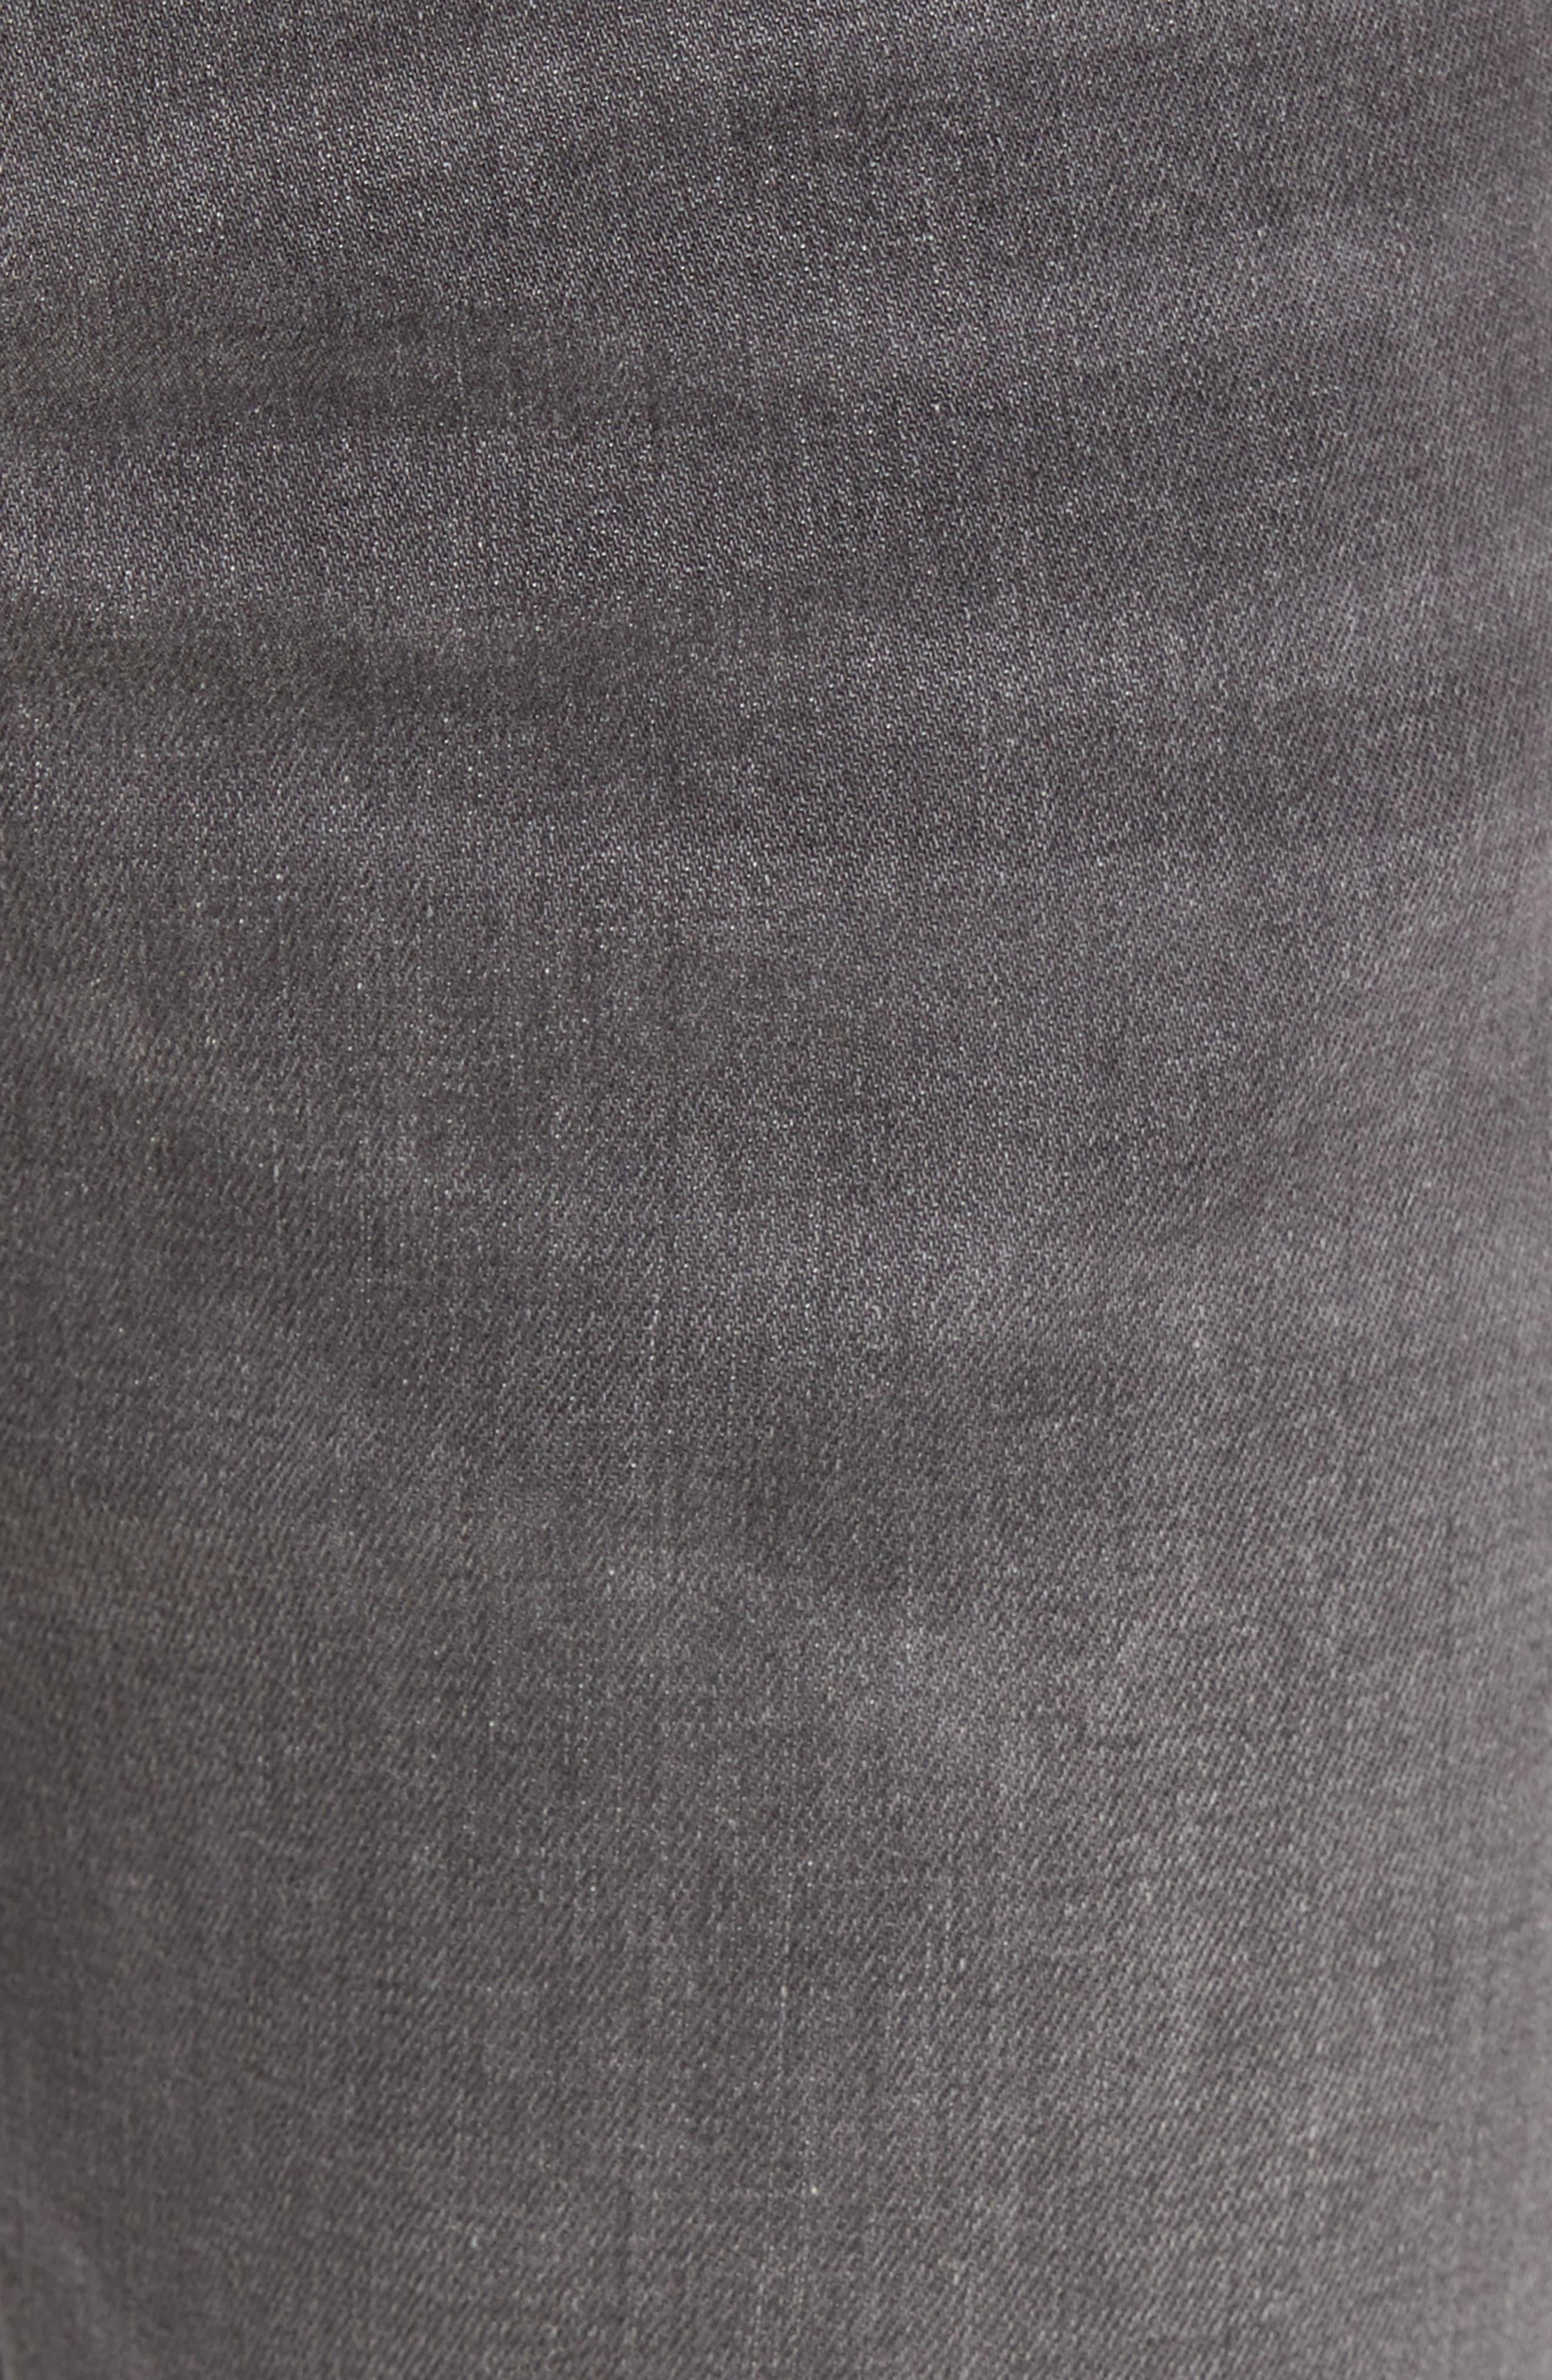 Hugo Boss 708 Stonewash Denim Jeans,                             Alternate thumbnail 5, color,                             021